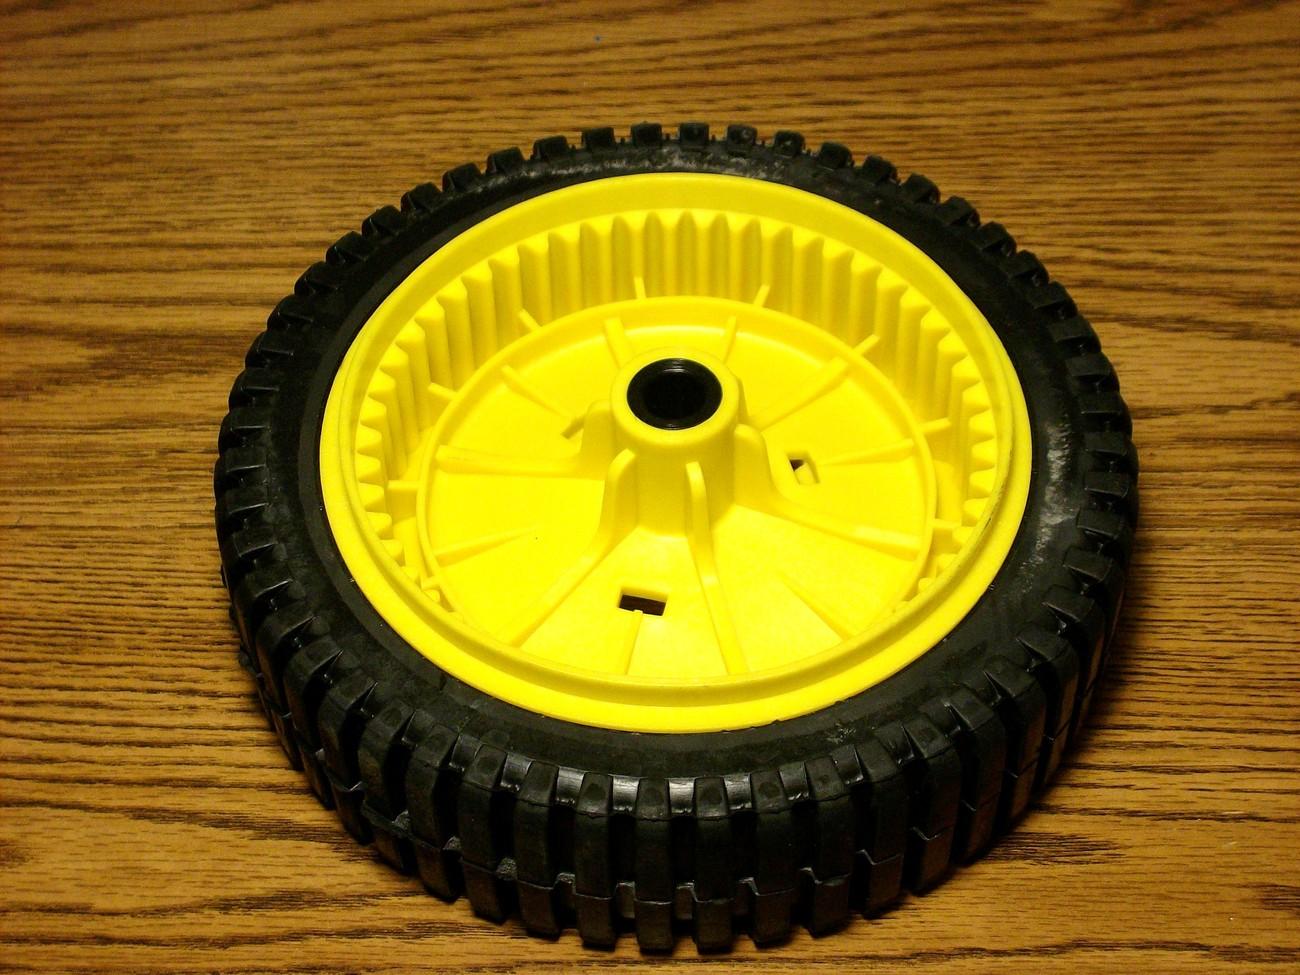 Craftsman self propelled drive wheel tire 151156, 193144